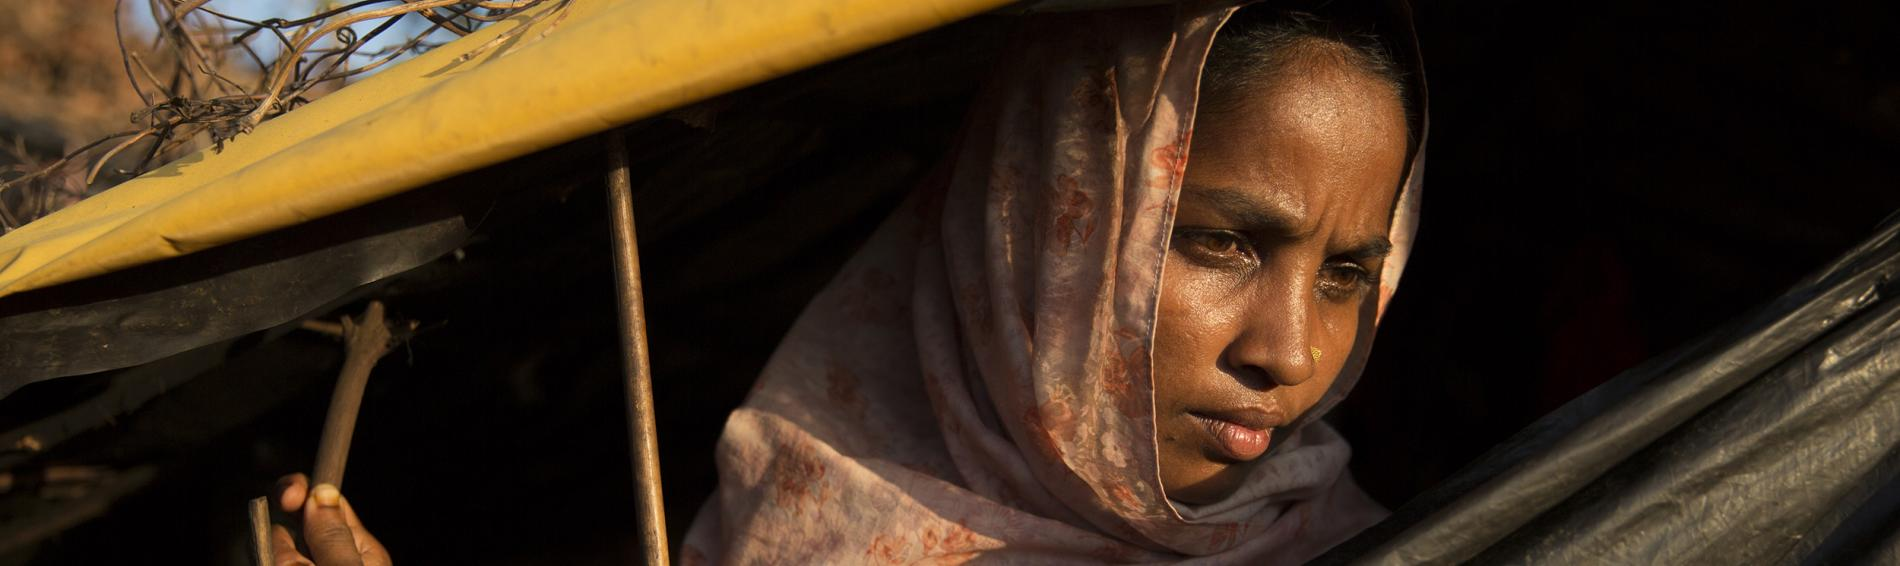 Geflüchtete Rohingya in Bangladesch. Foto: A. Finistre